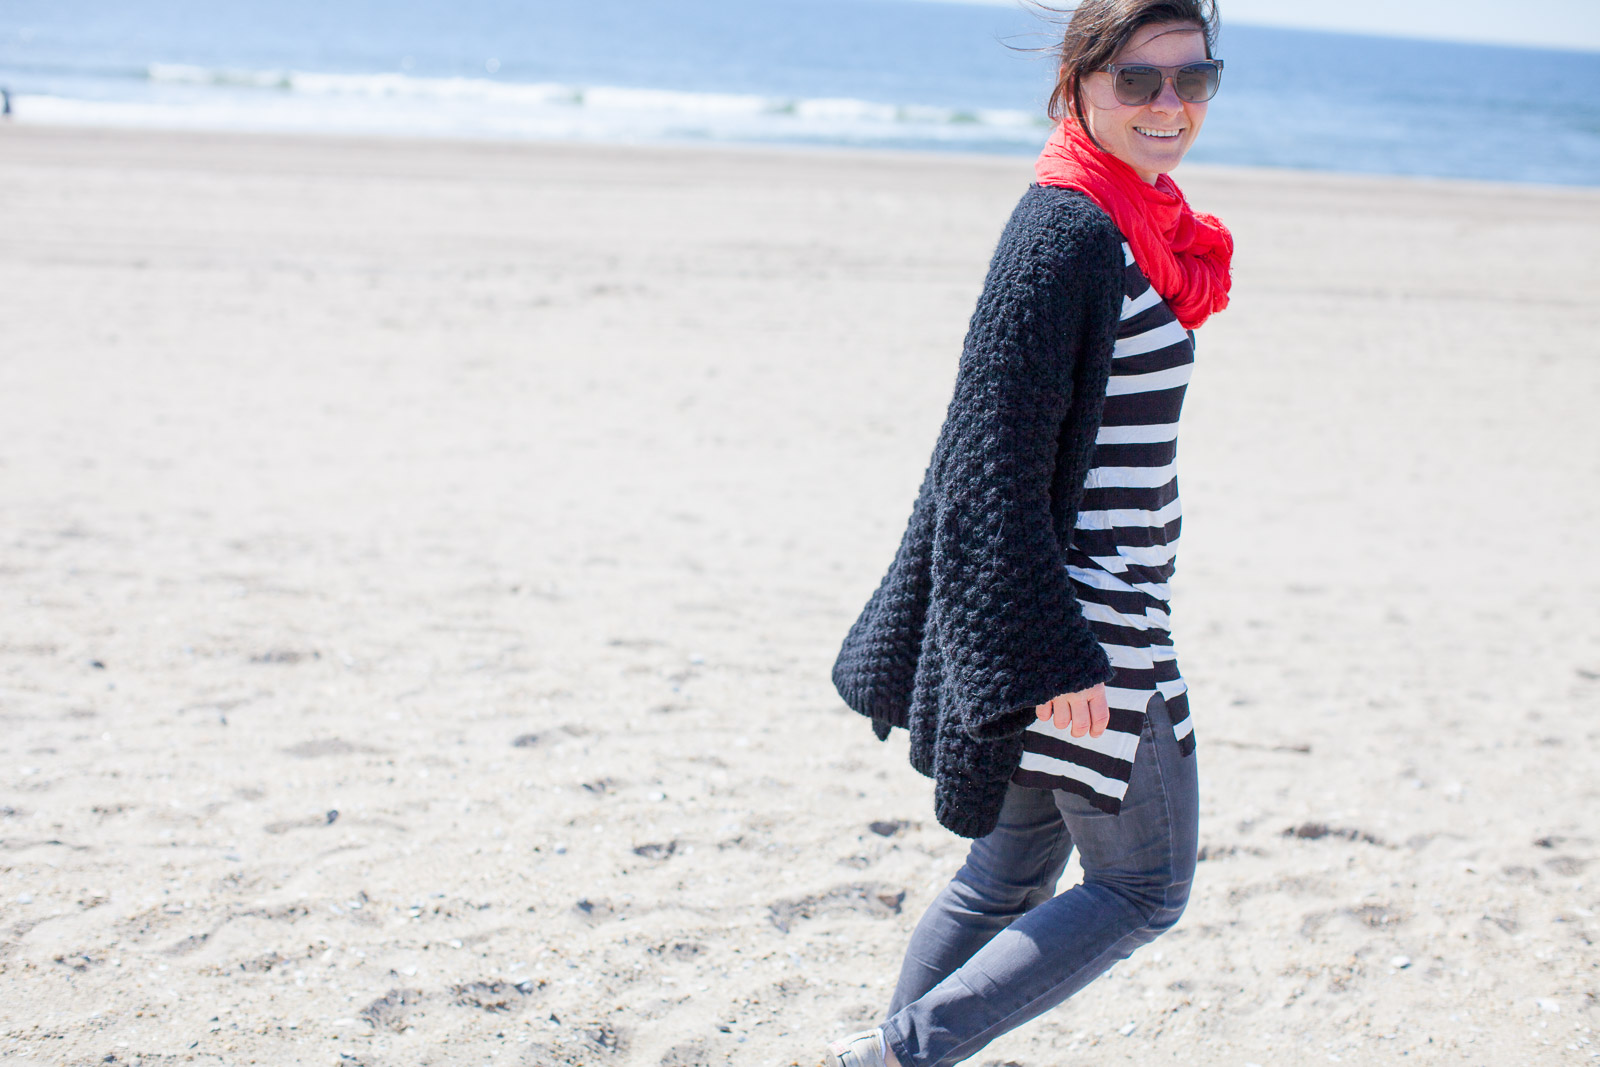 rockaway-beach-april-2015-robertiaga-2